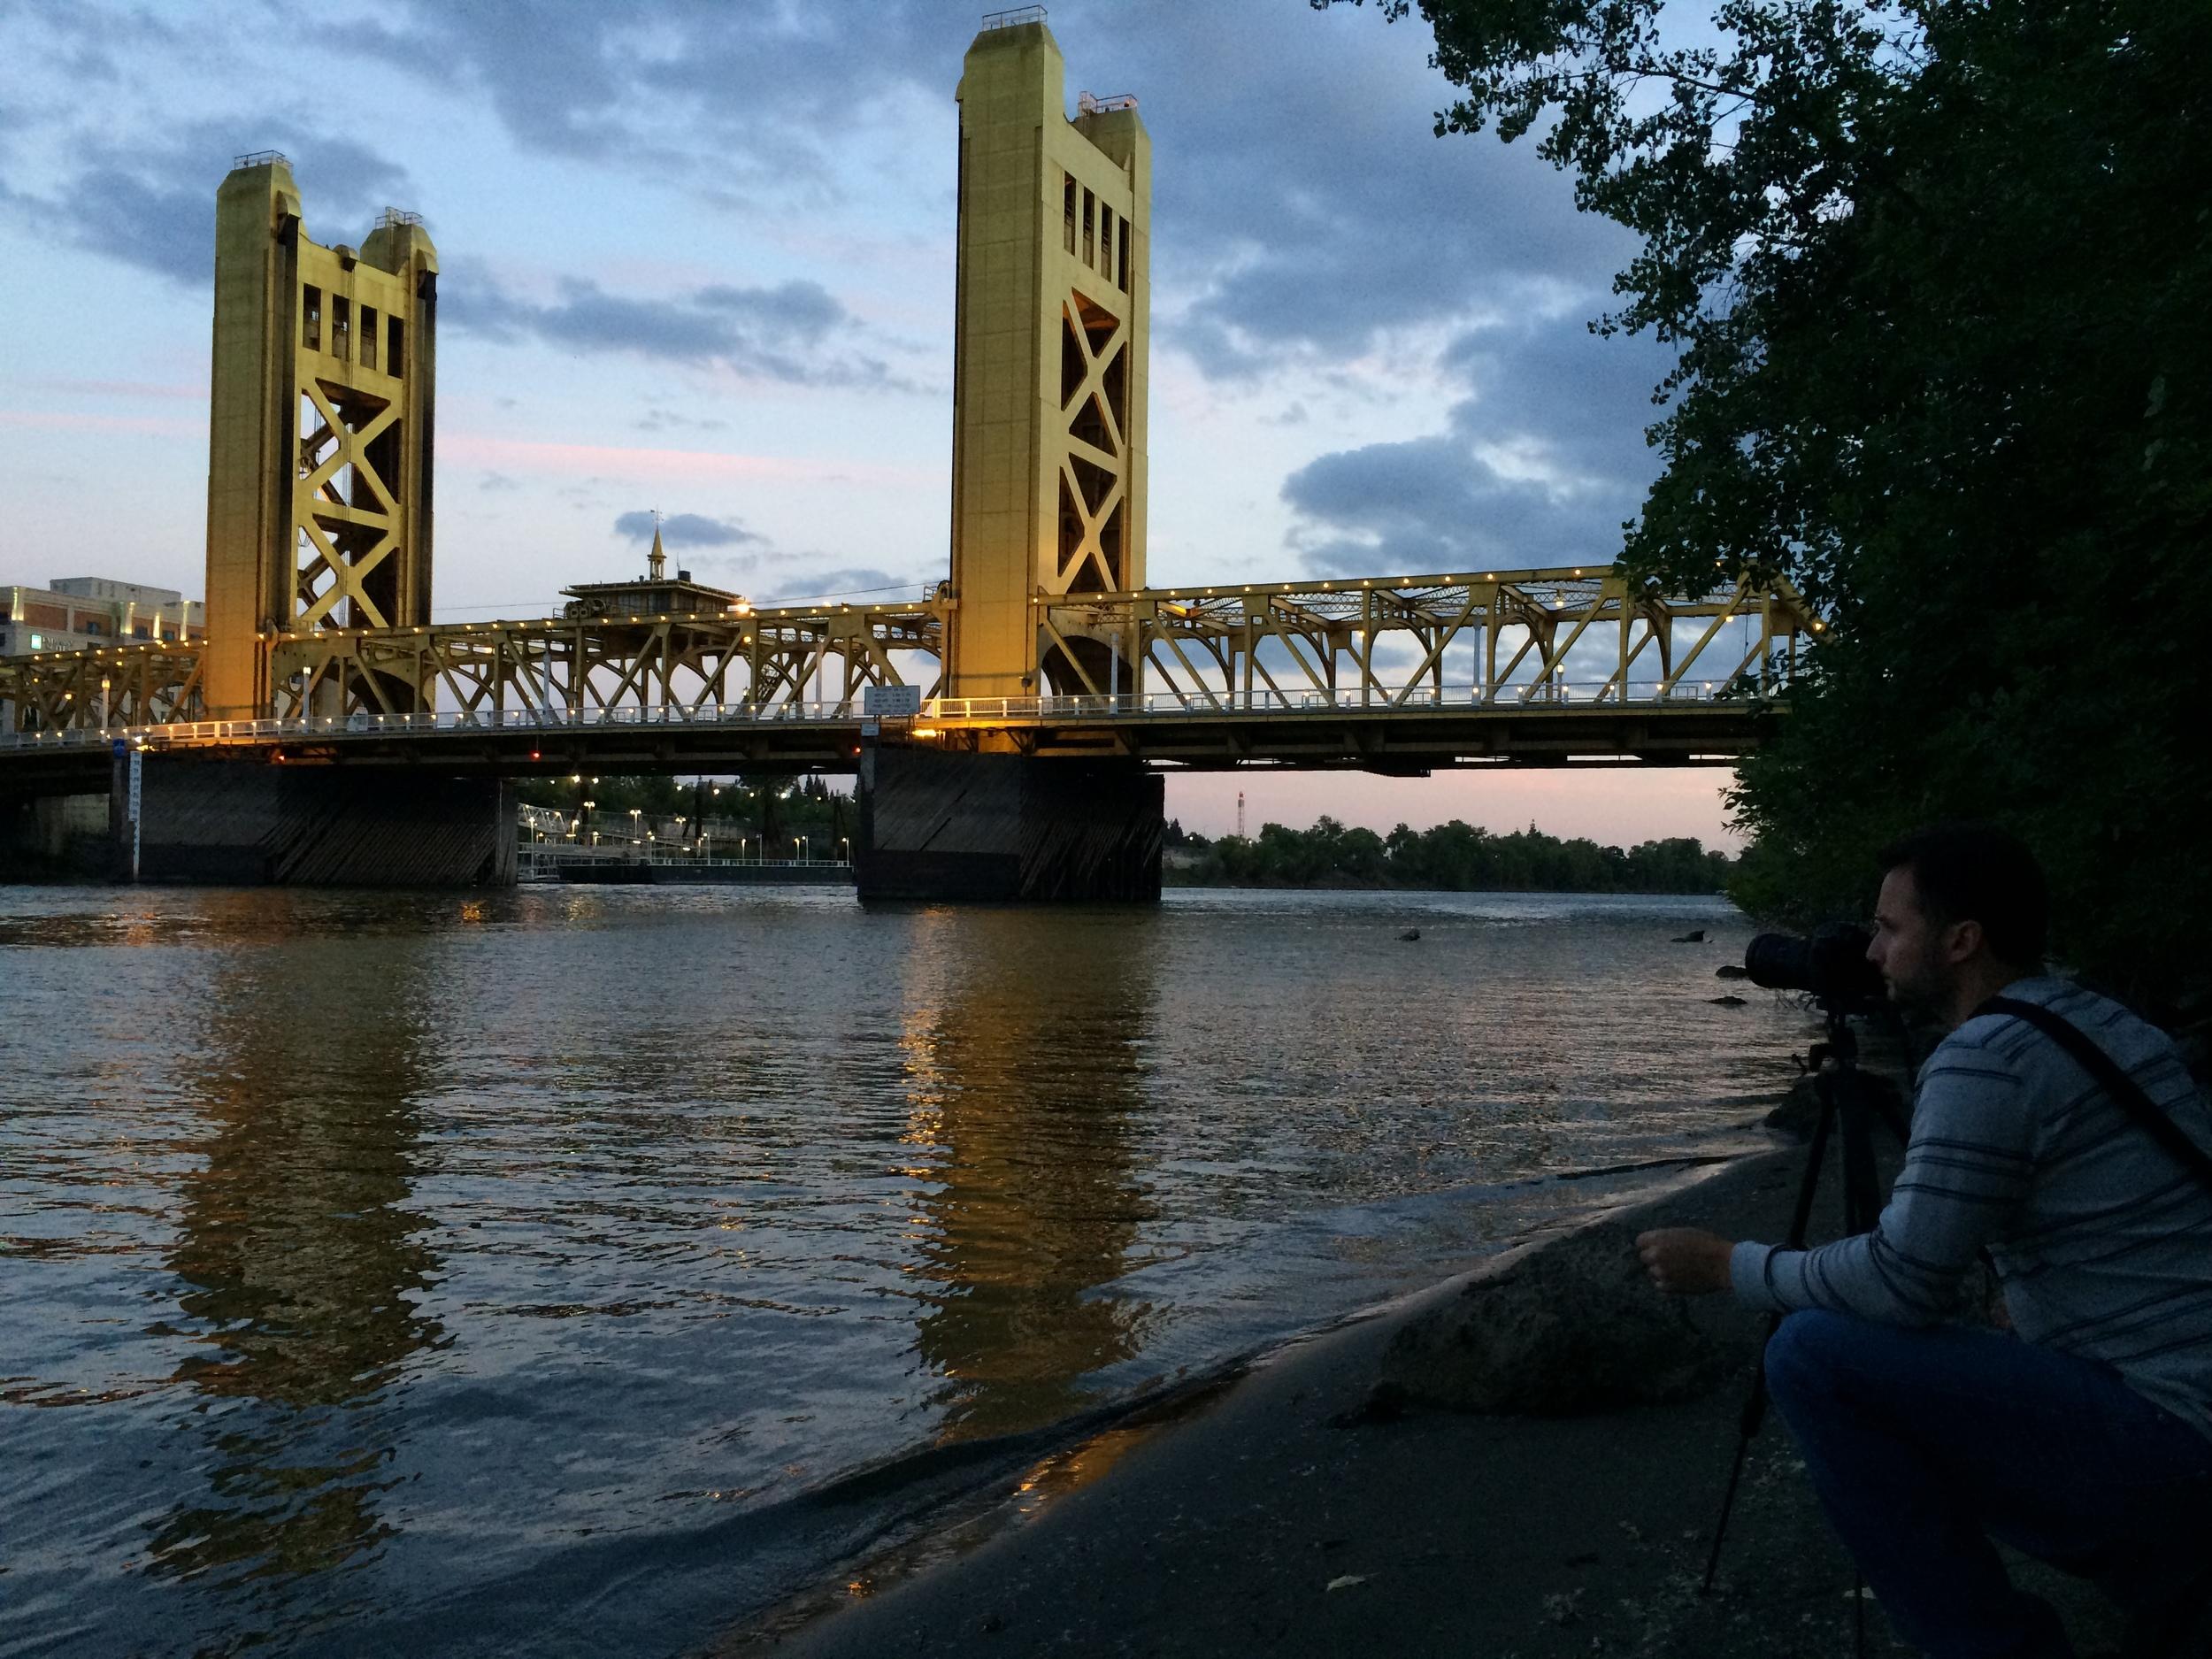 2014 photo shoot of Sacramento's Tower Bridge